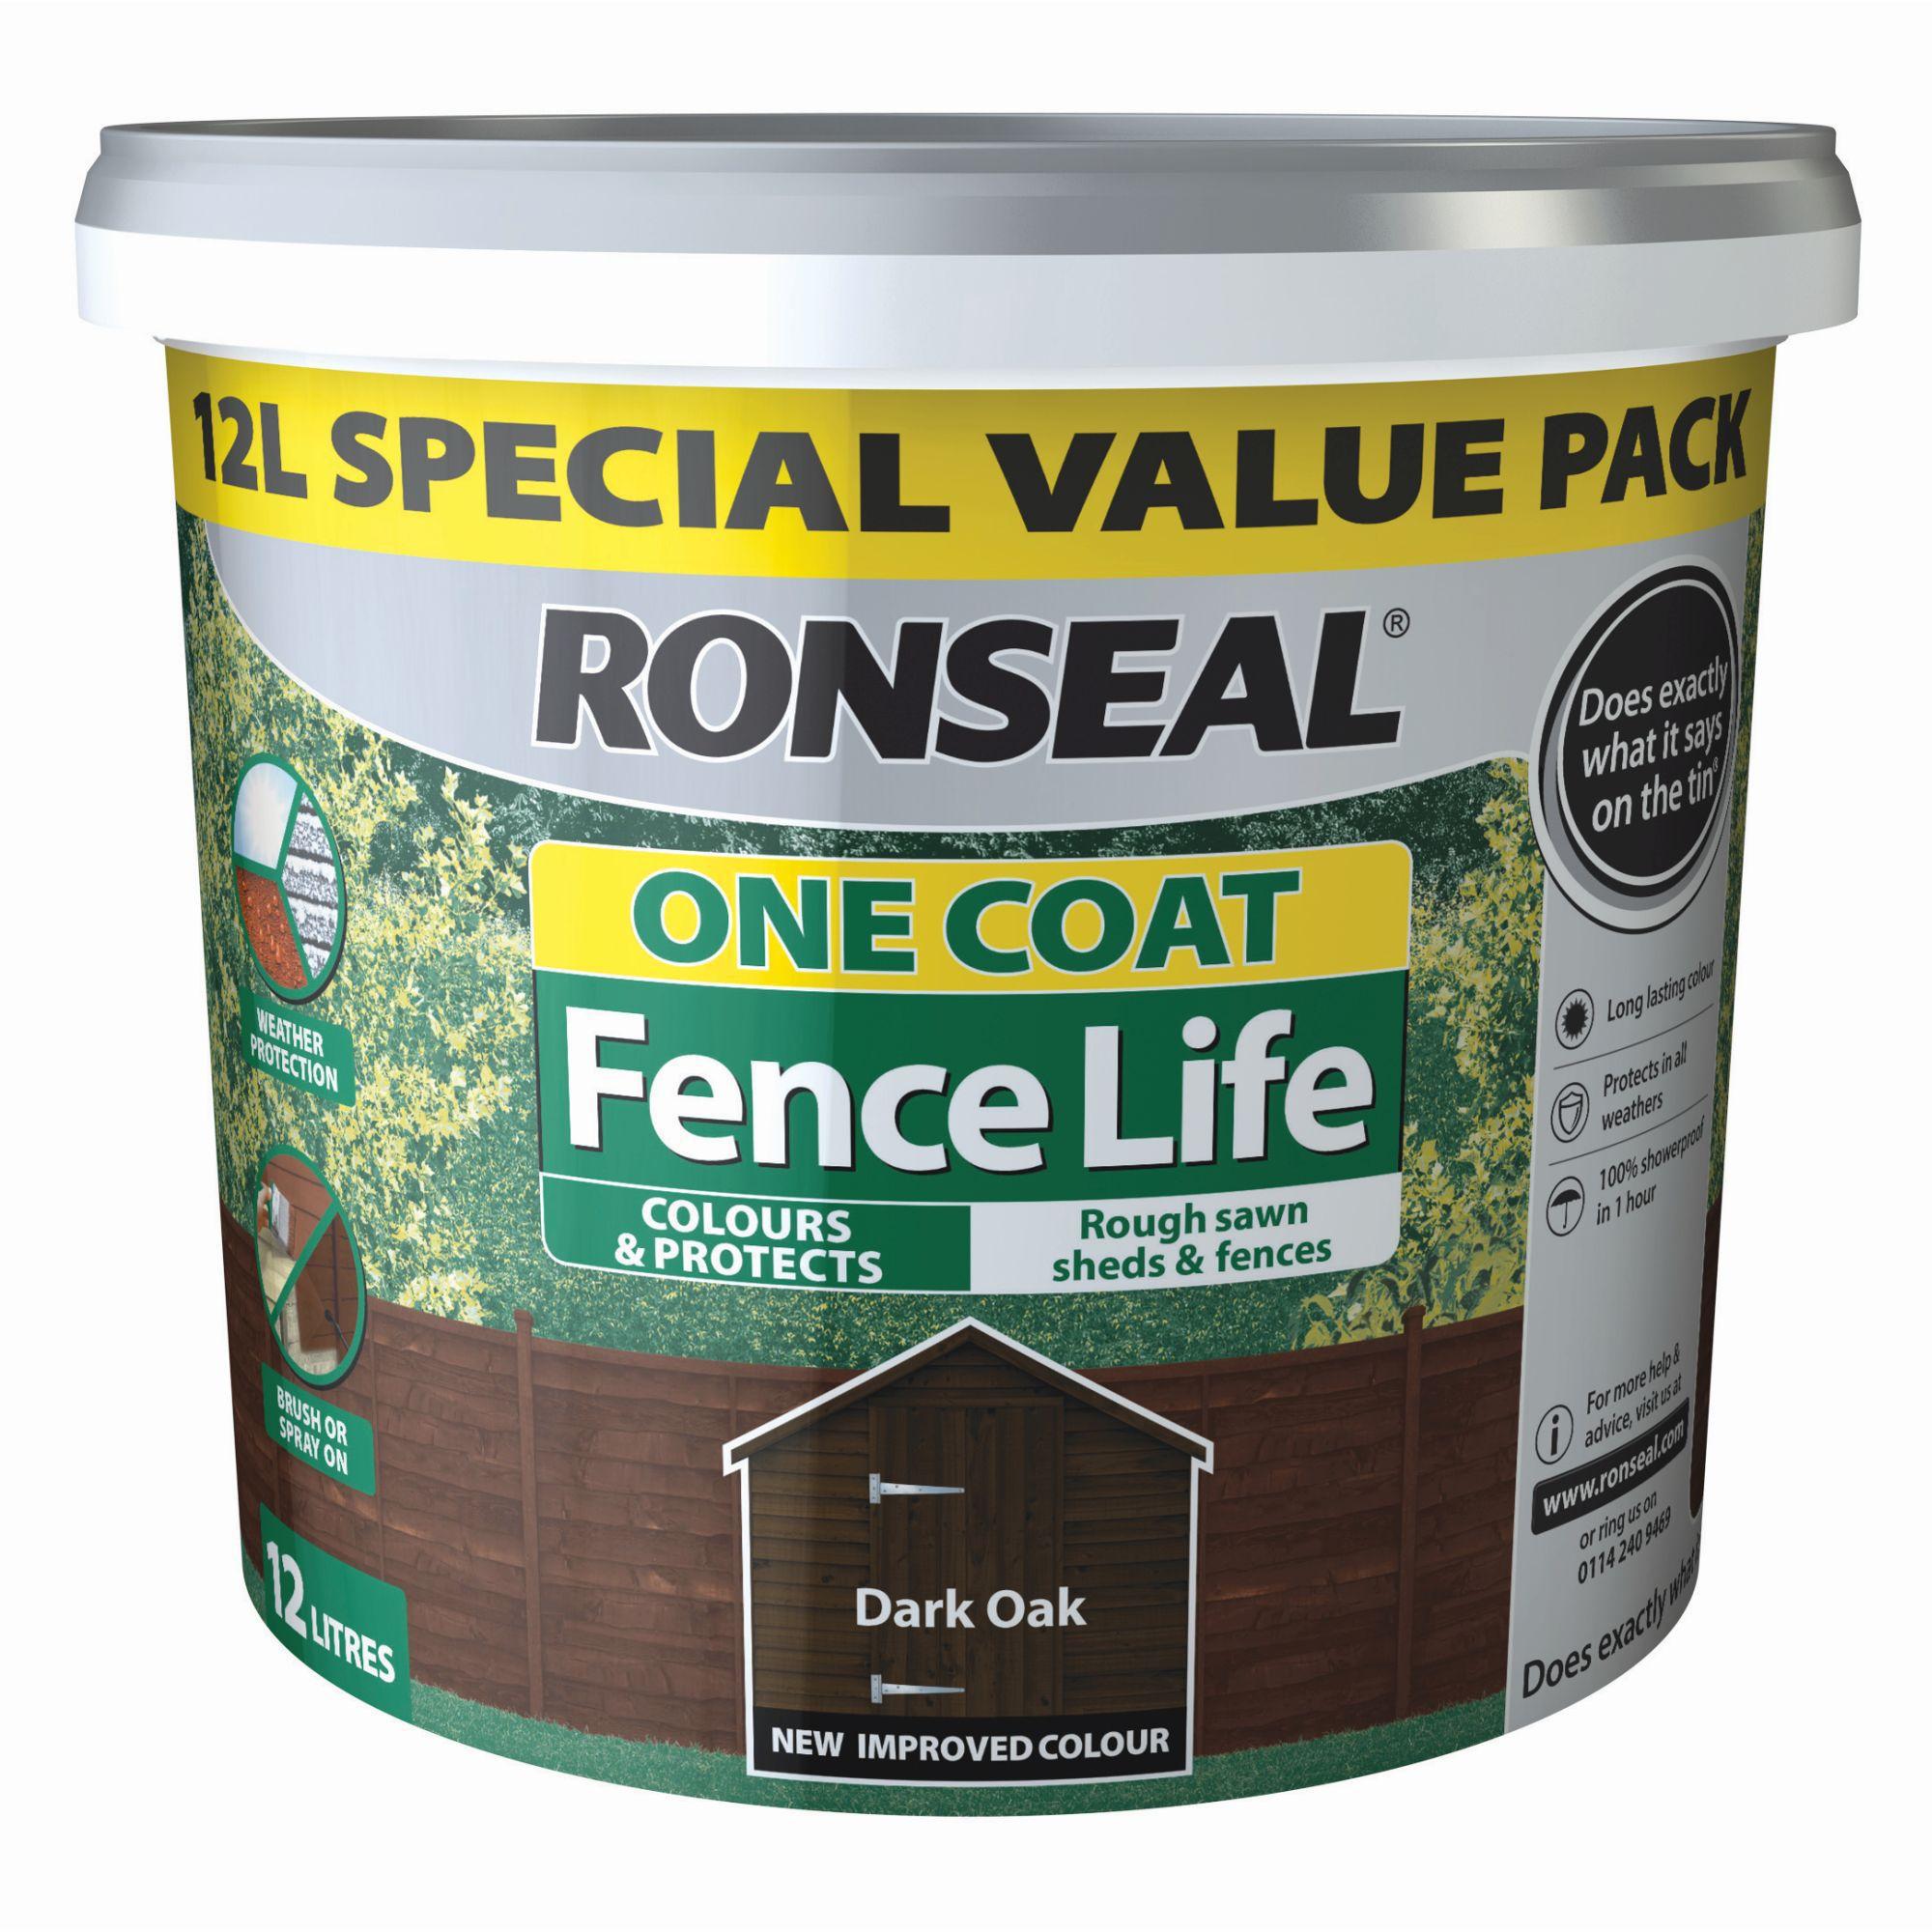 Ronseal One coat fence life Dark oak